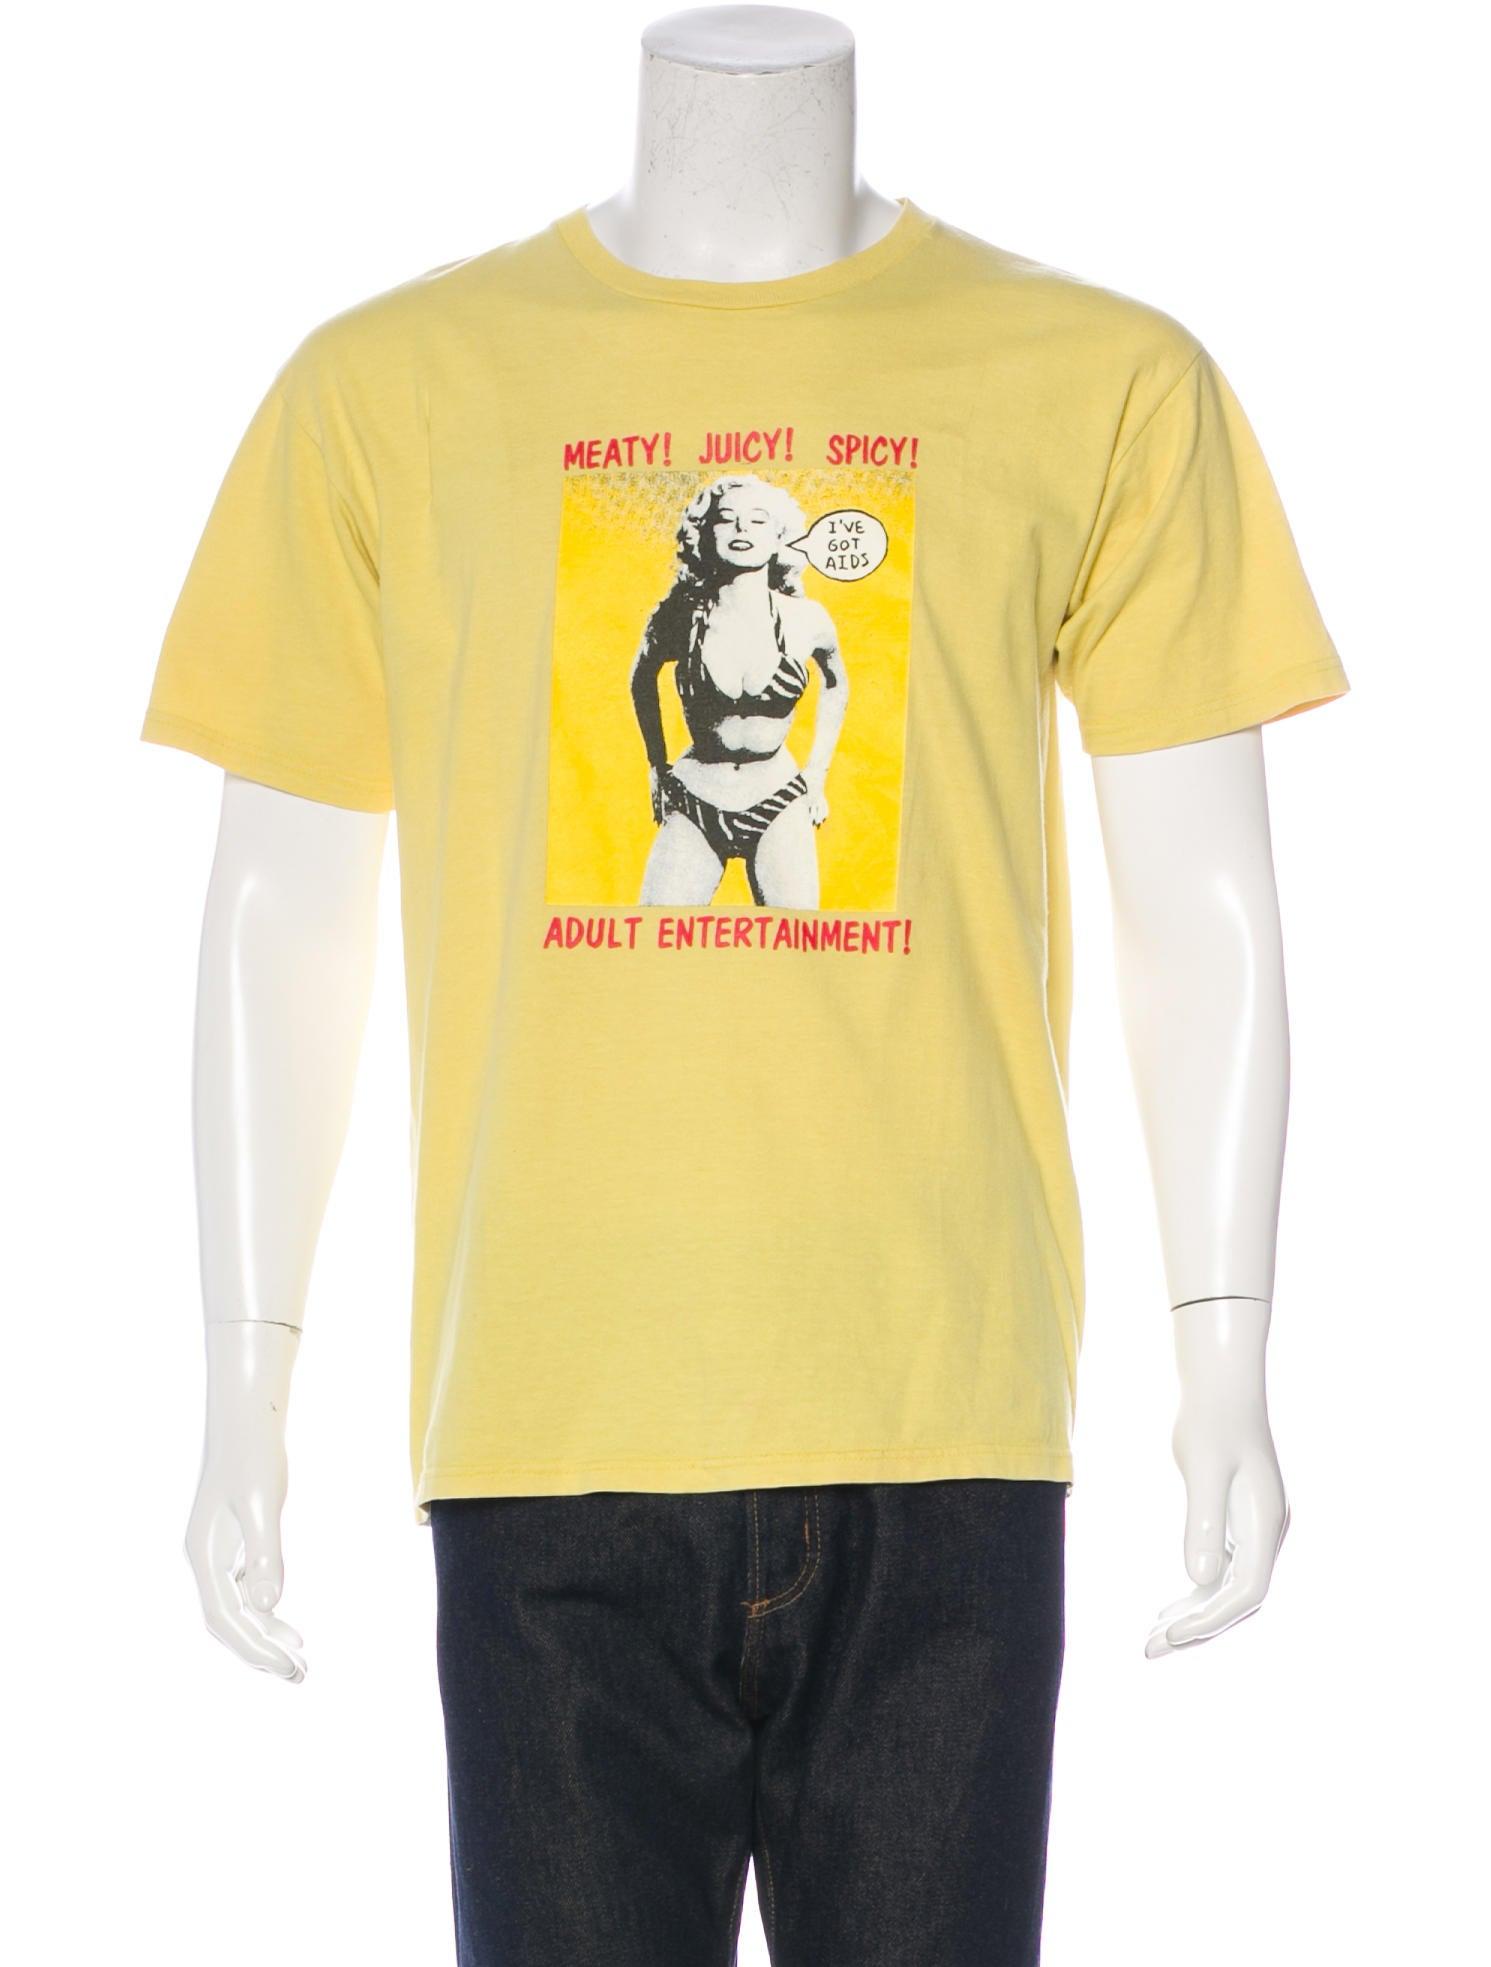 Supreme graphic print t shirt clothing wspme20199 for T shirt graphic printing